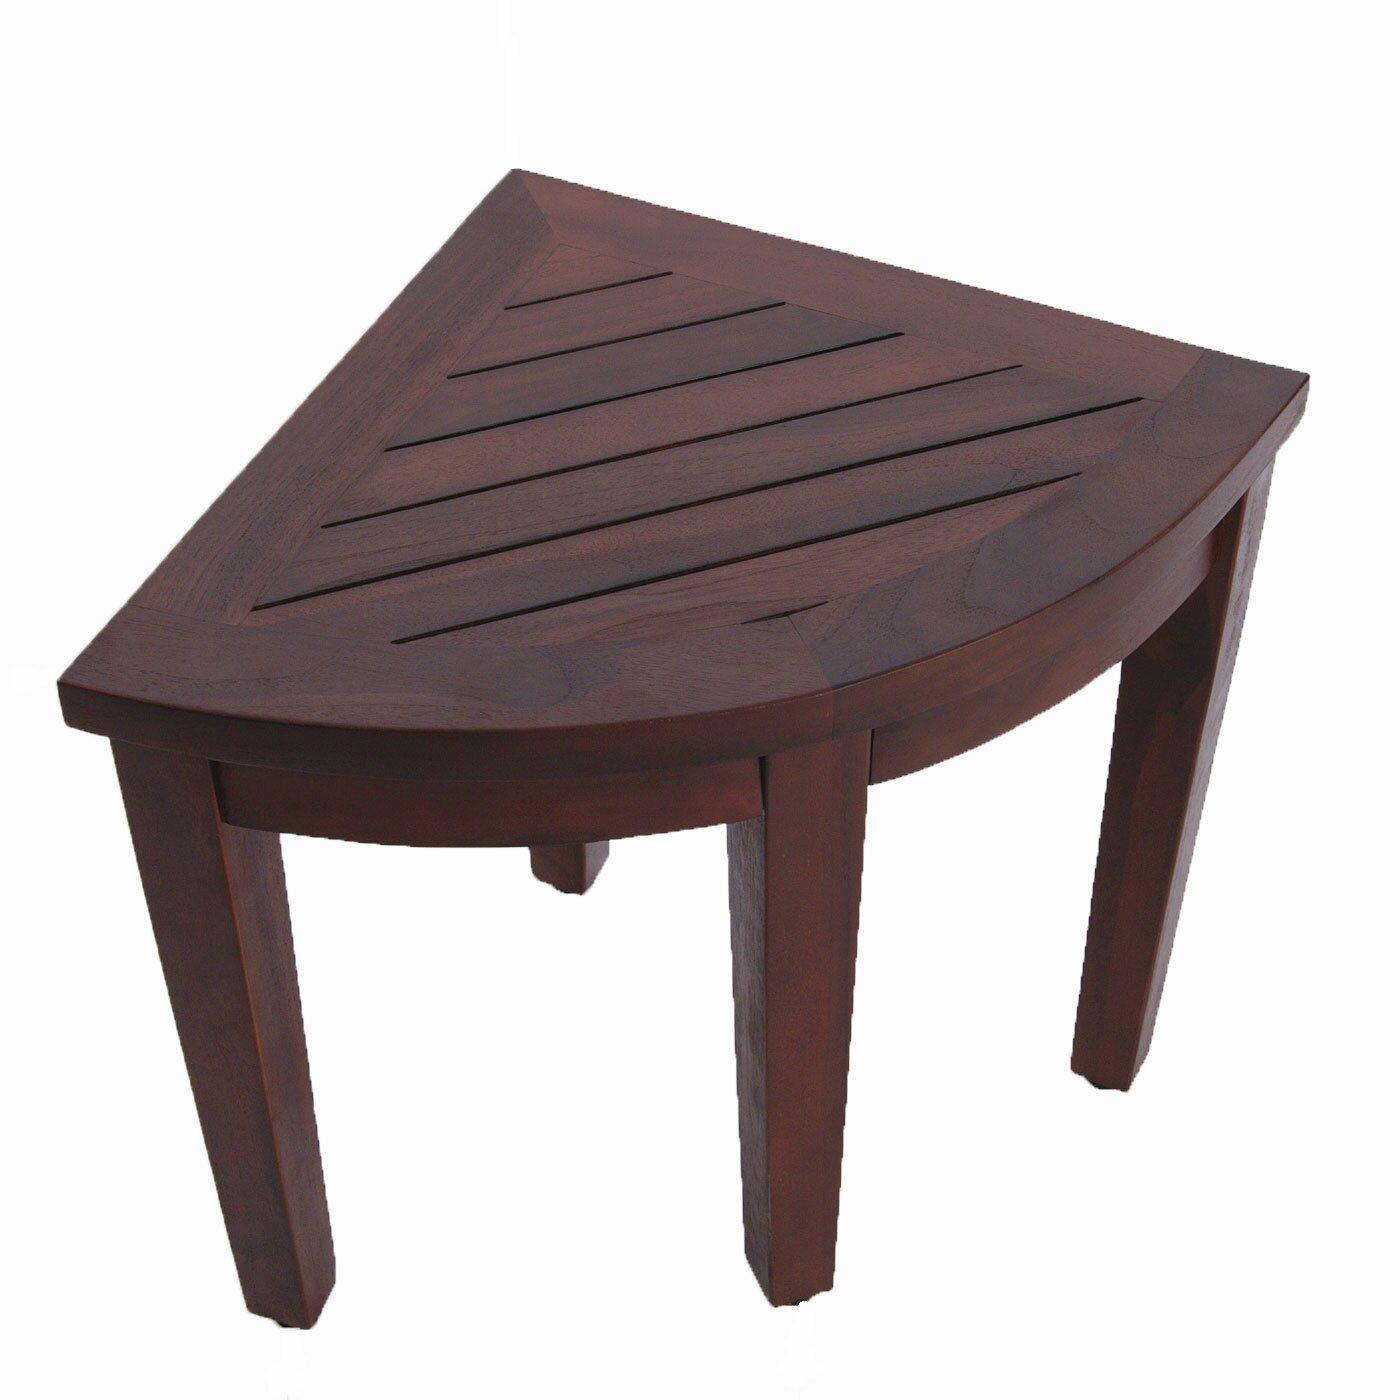 Decoteak oasis teak corner shower seat stool chair bench amp reviews